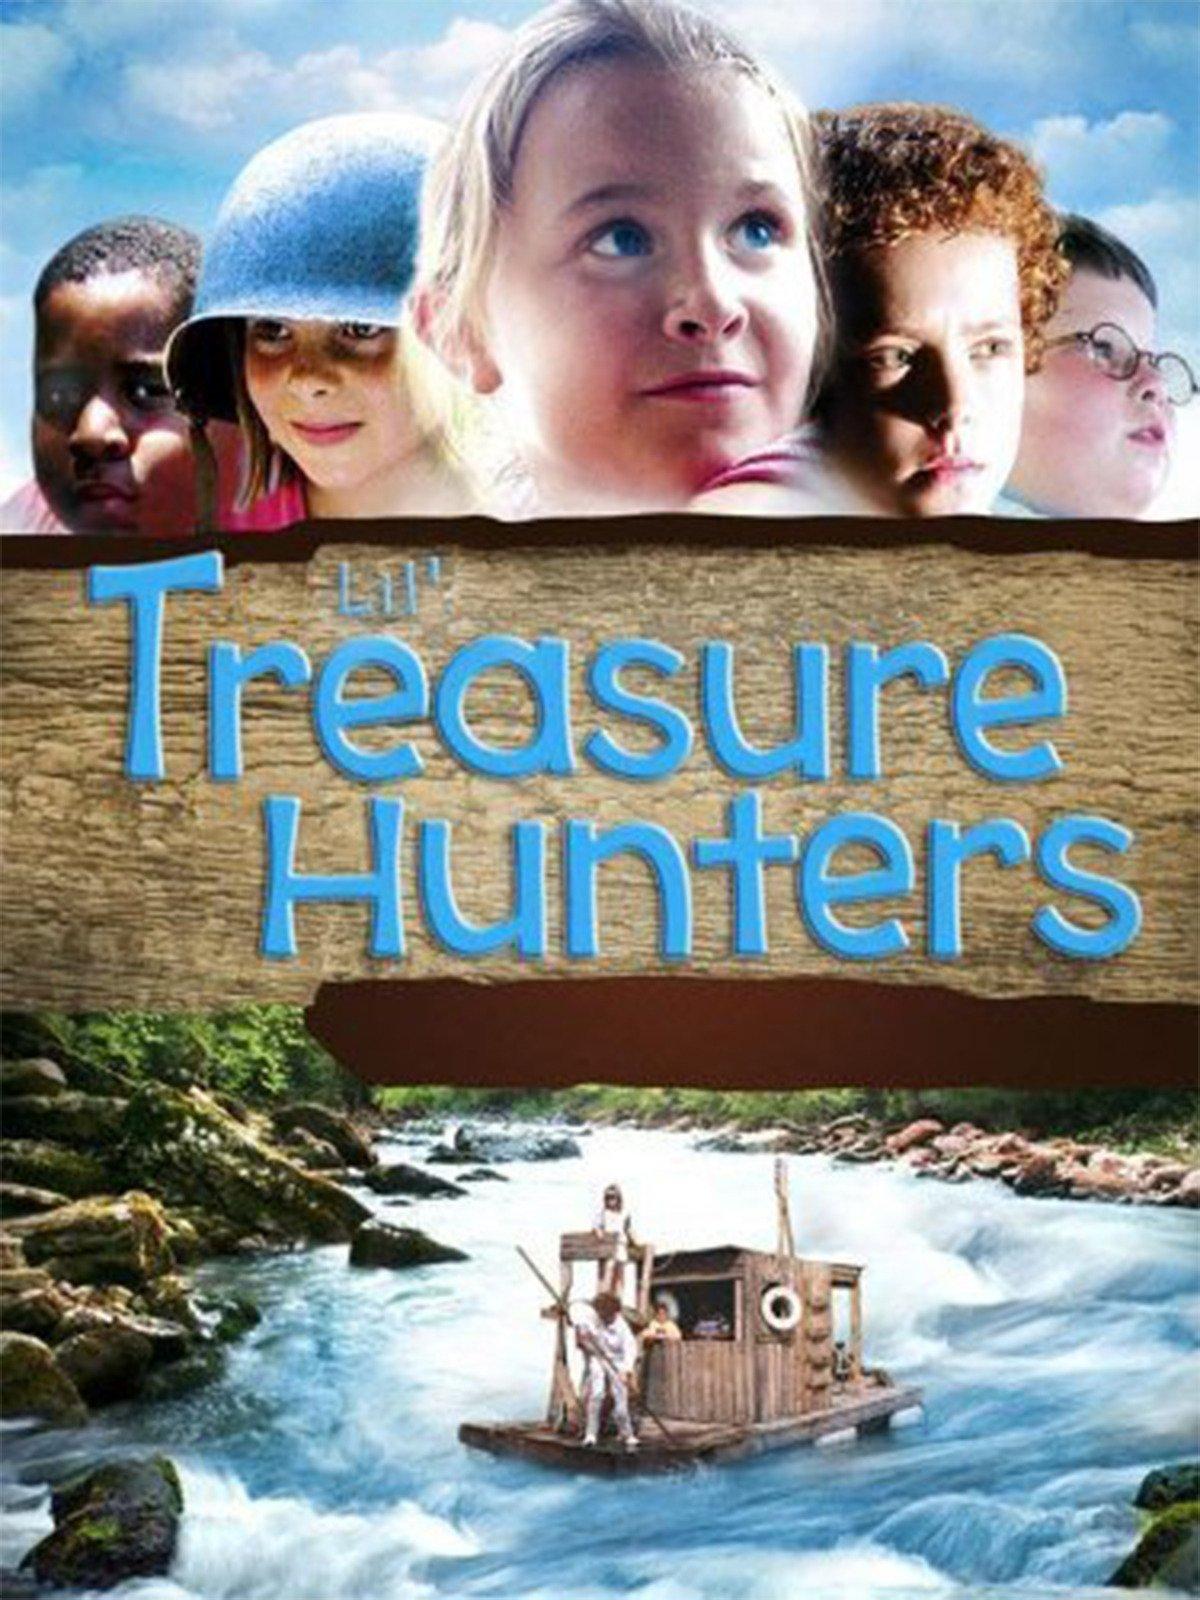 Lil Treasure Hunters on Amazon Prime Video UK